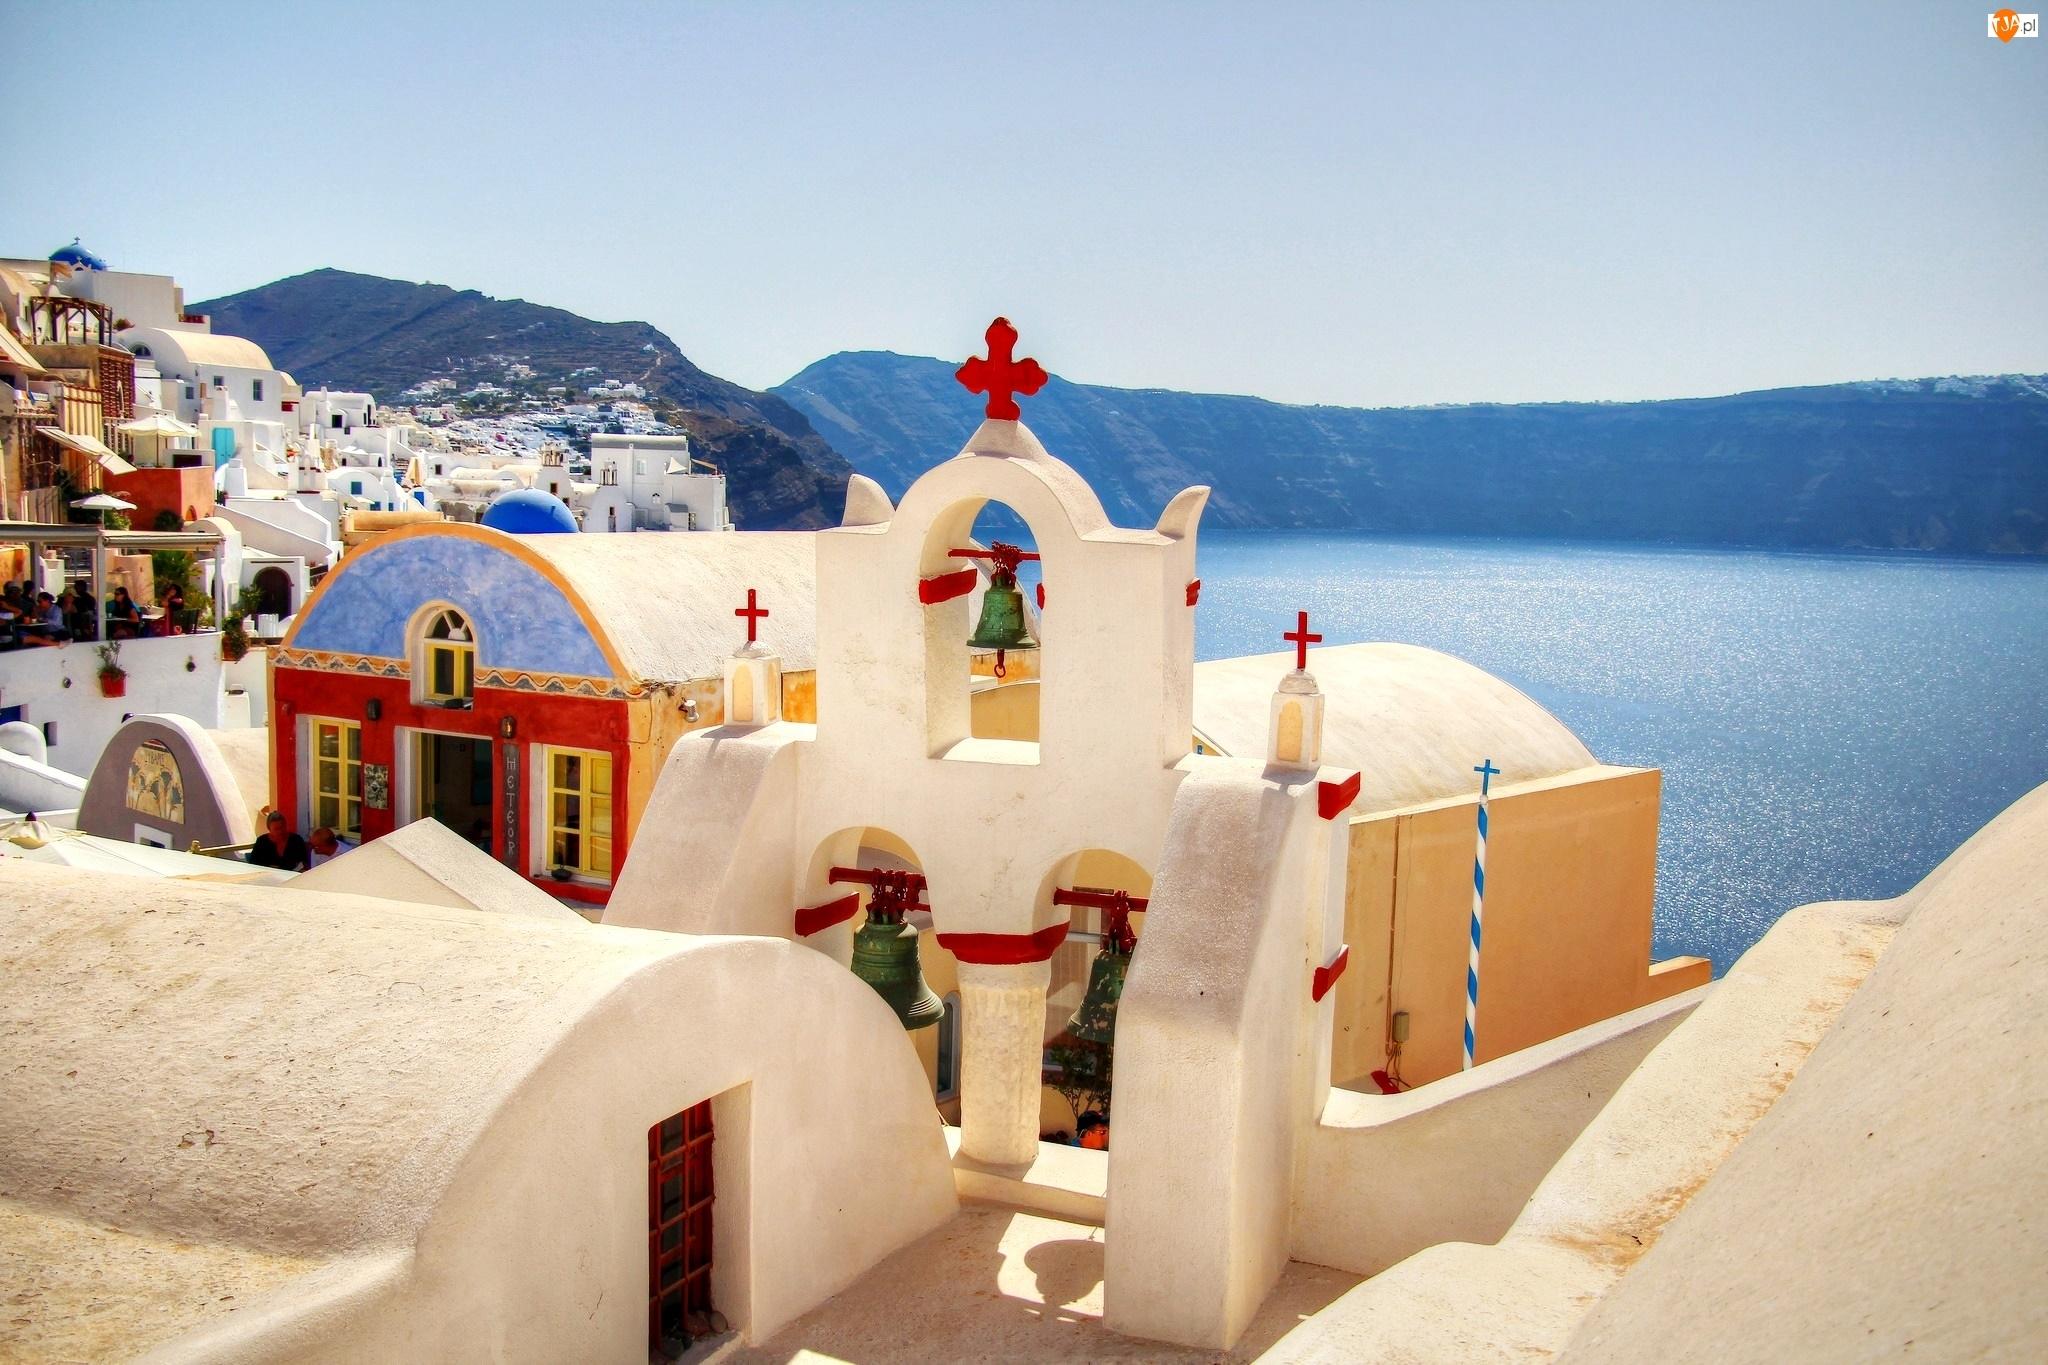 Kościoły, Grecja, Morze, Santorini, Góry